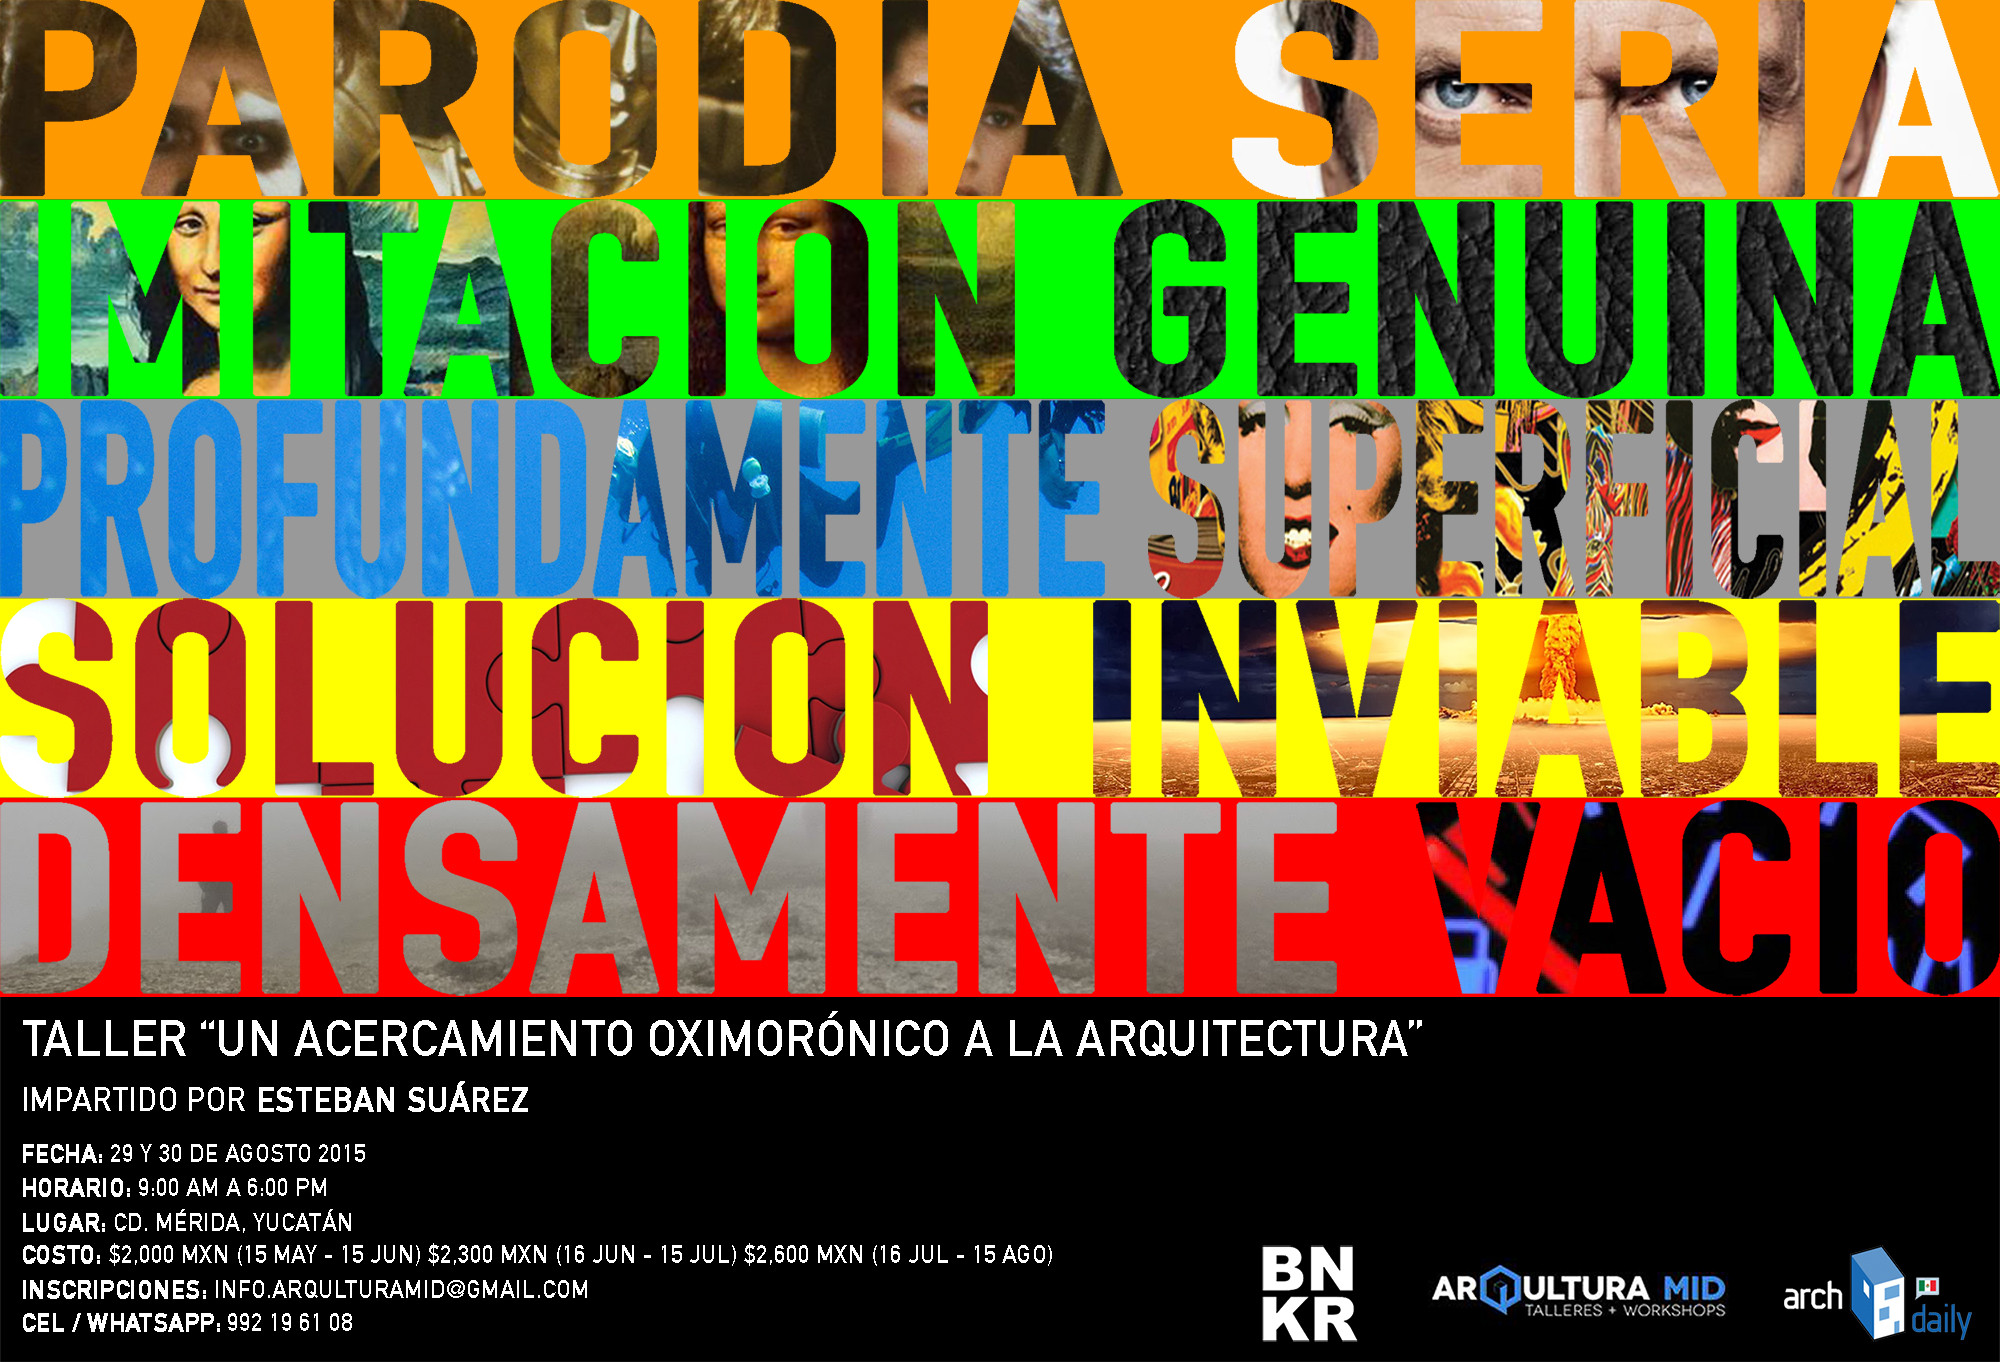 Taller: Un acercamiento oximorónico a la arquitectura / Mérida, Yucatán